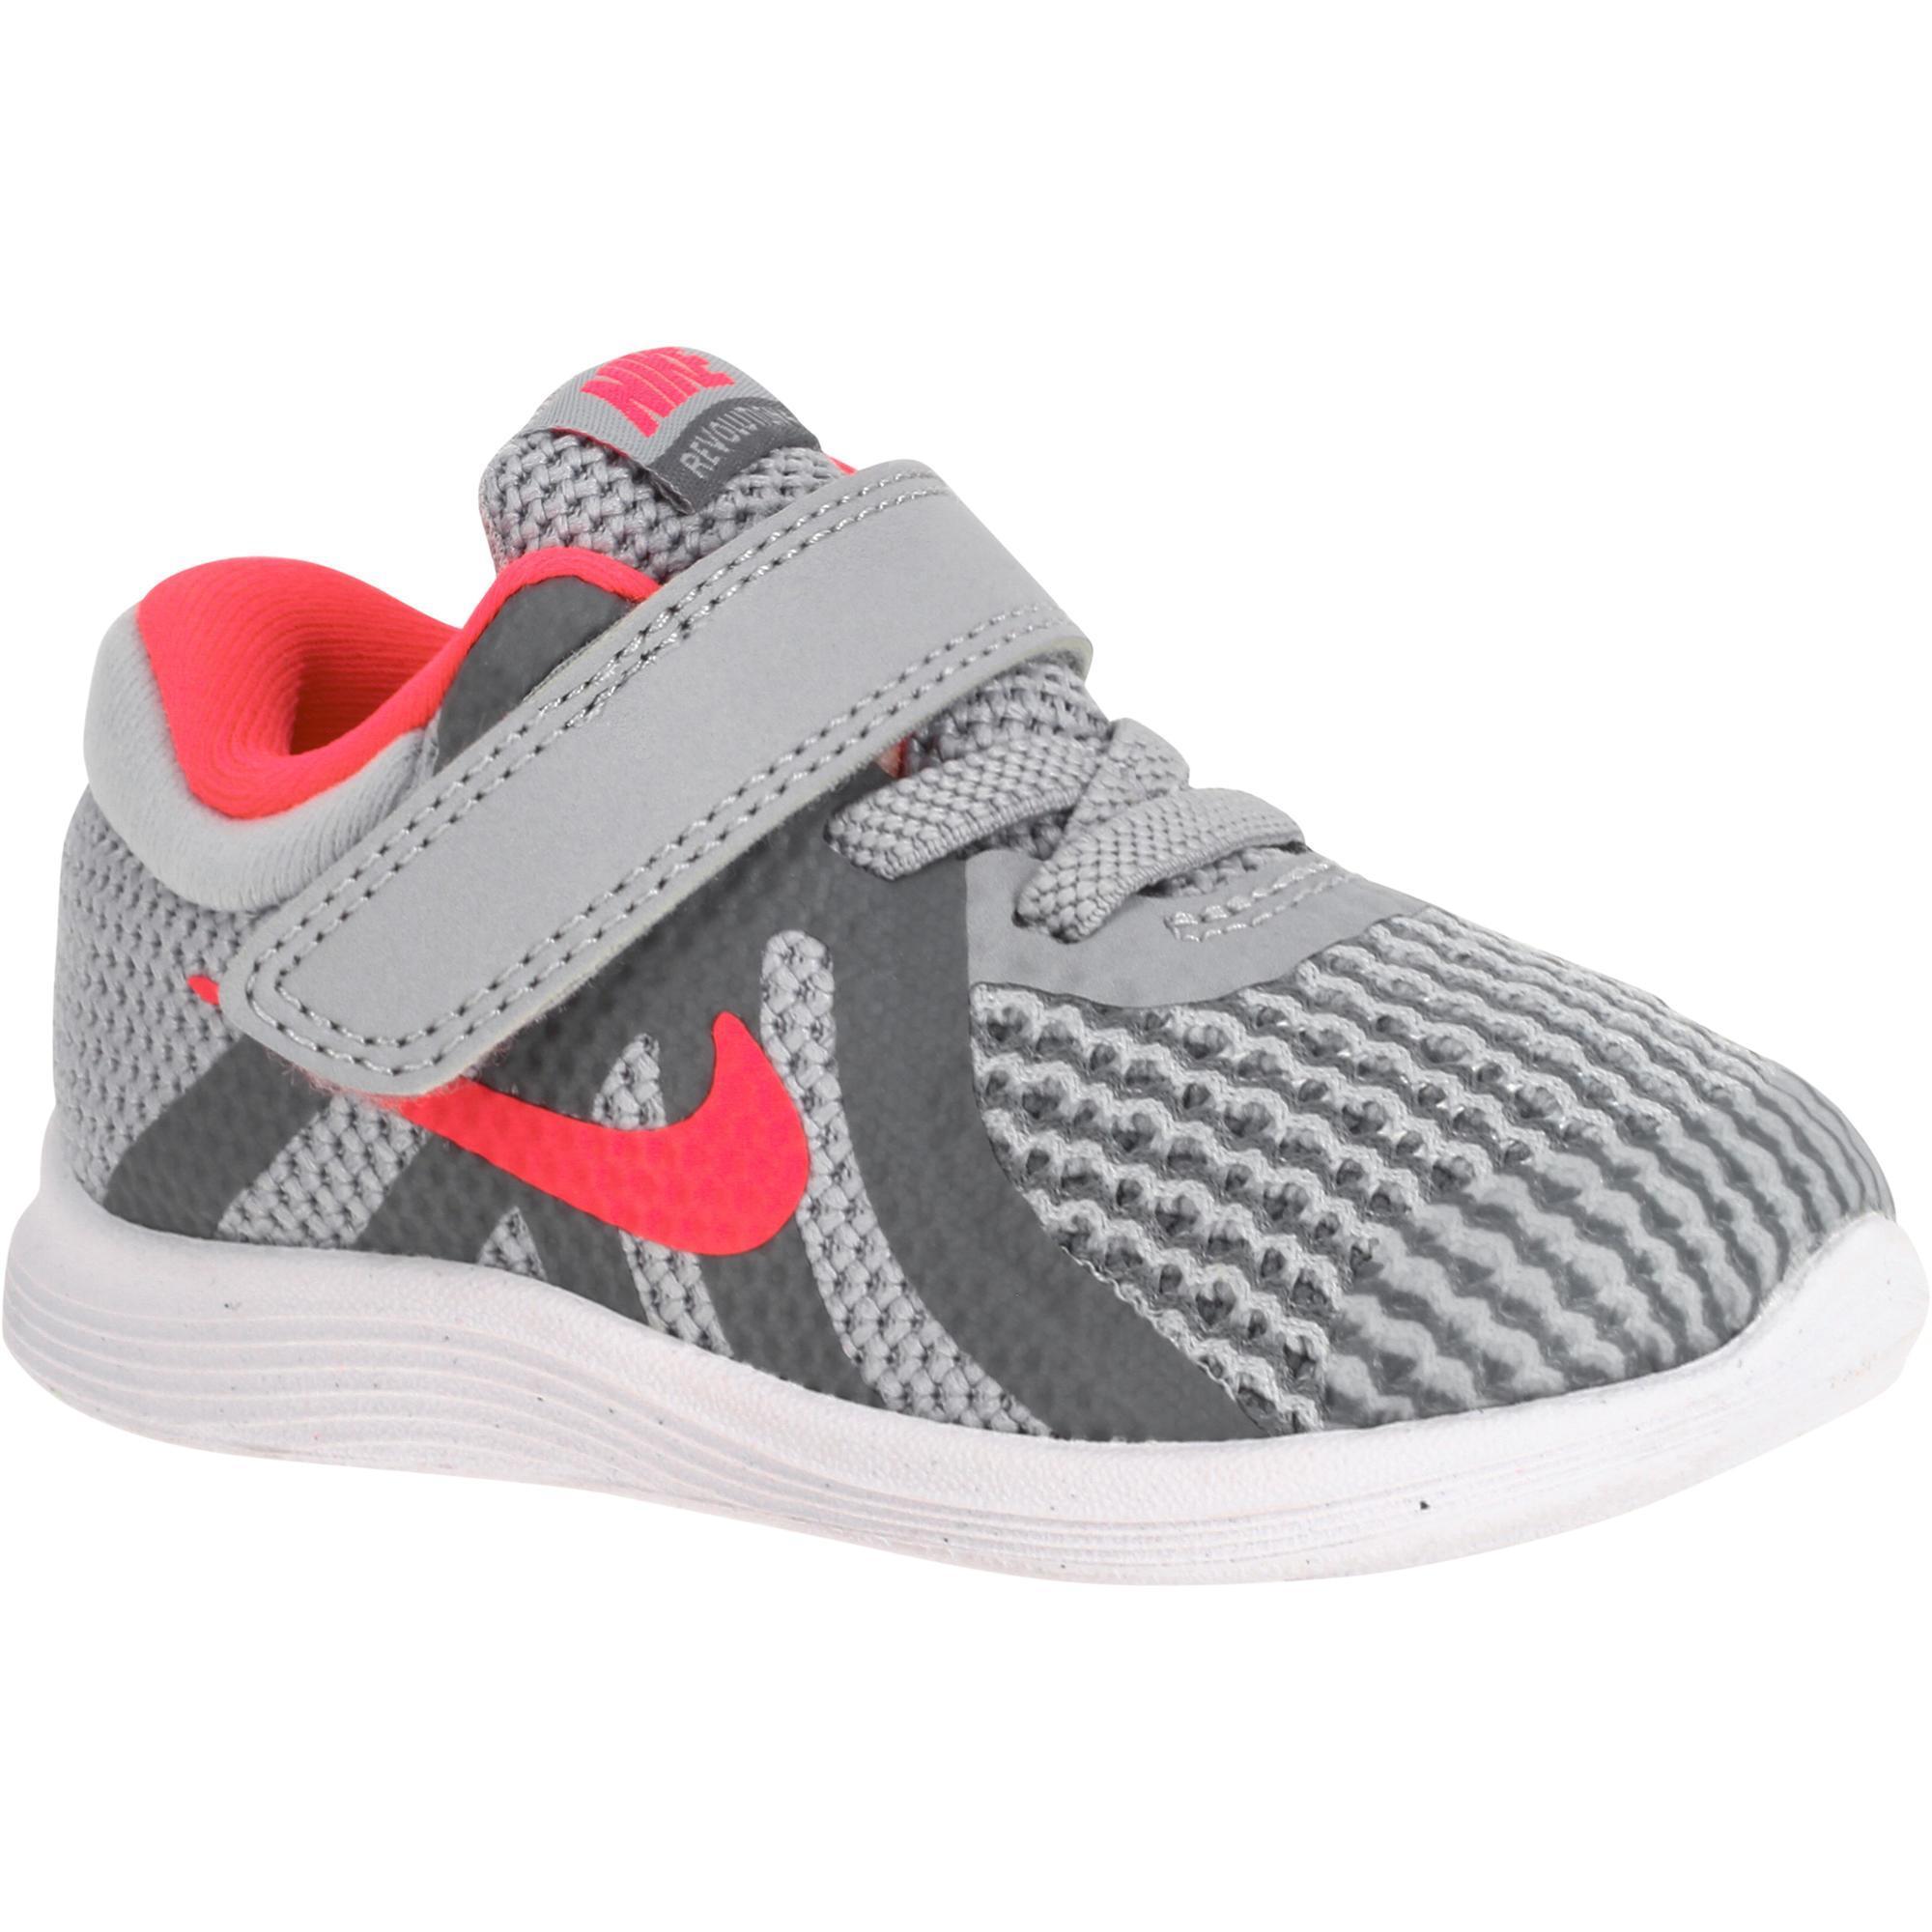 new style c27c8 645ce Nike - Decathlon